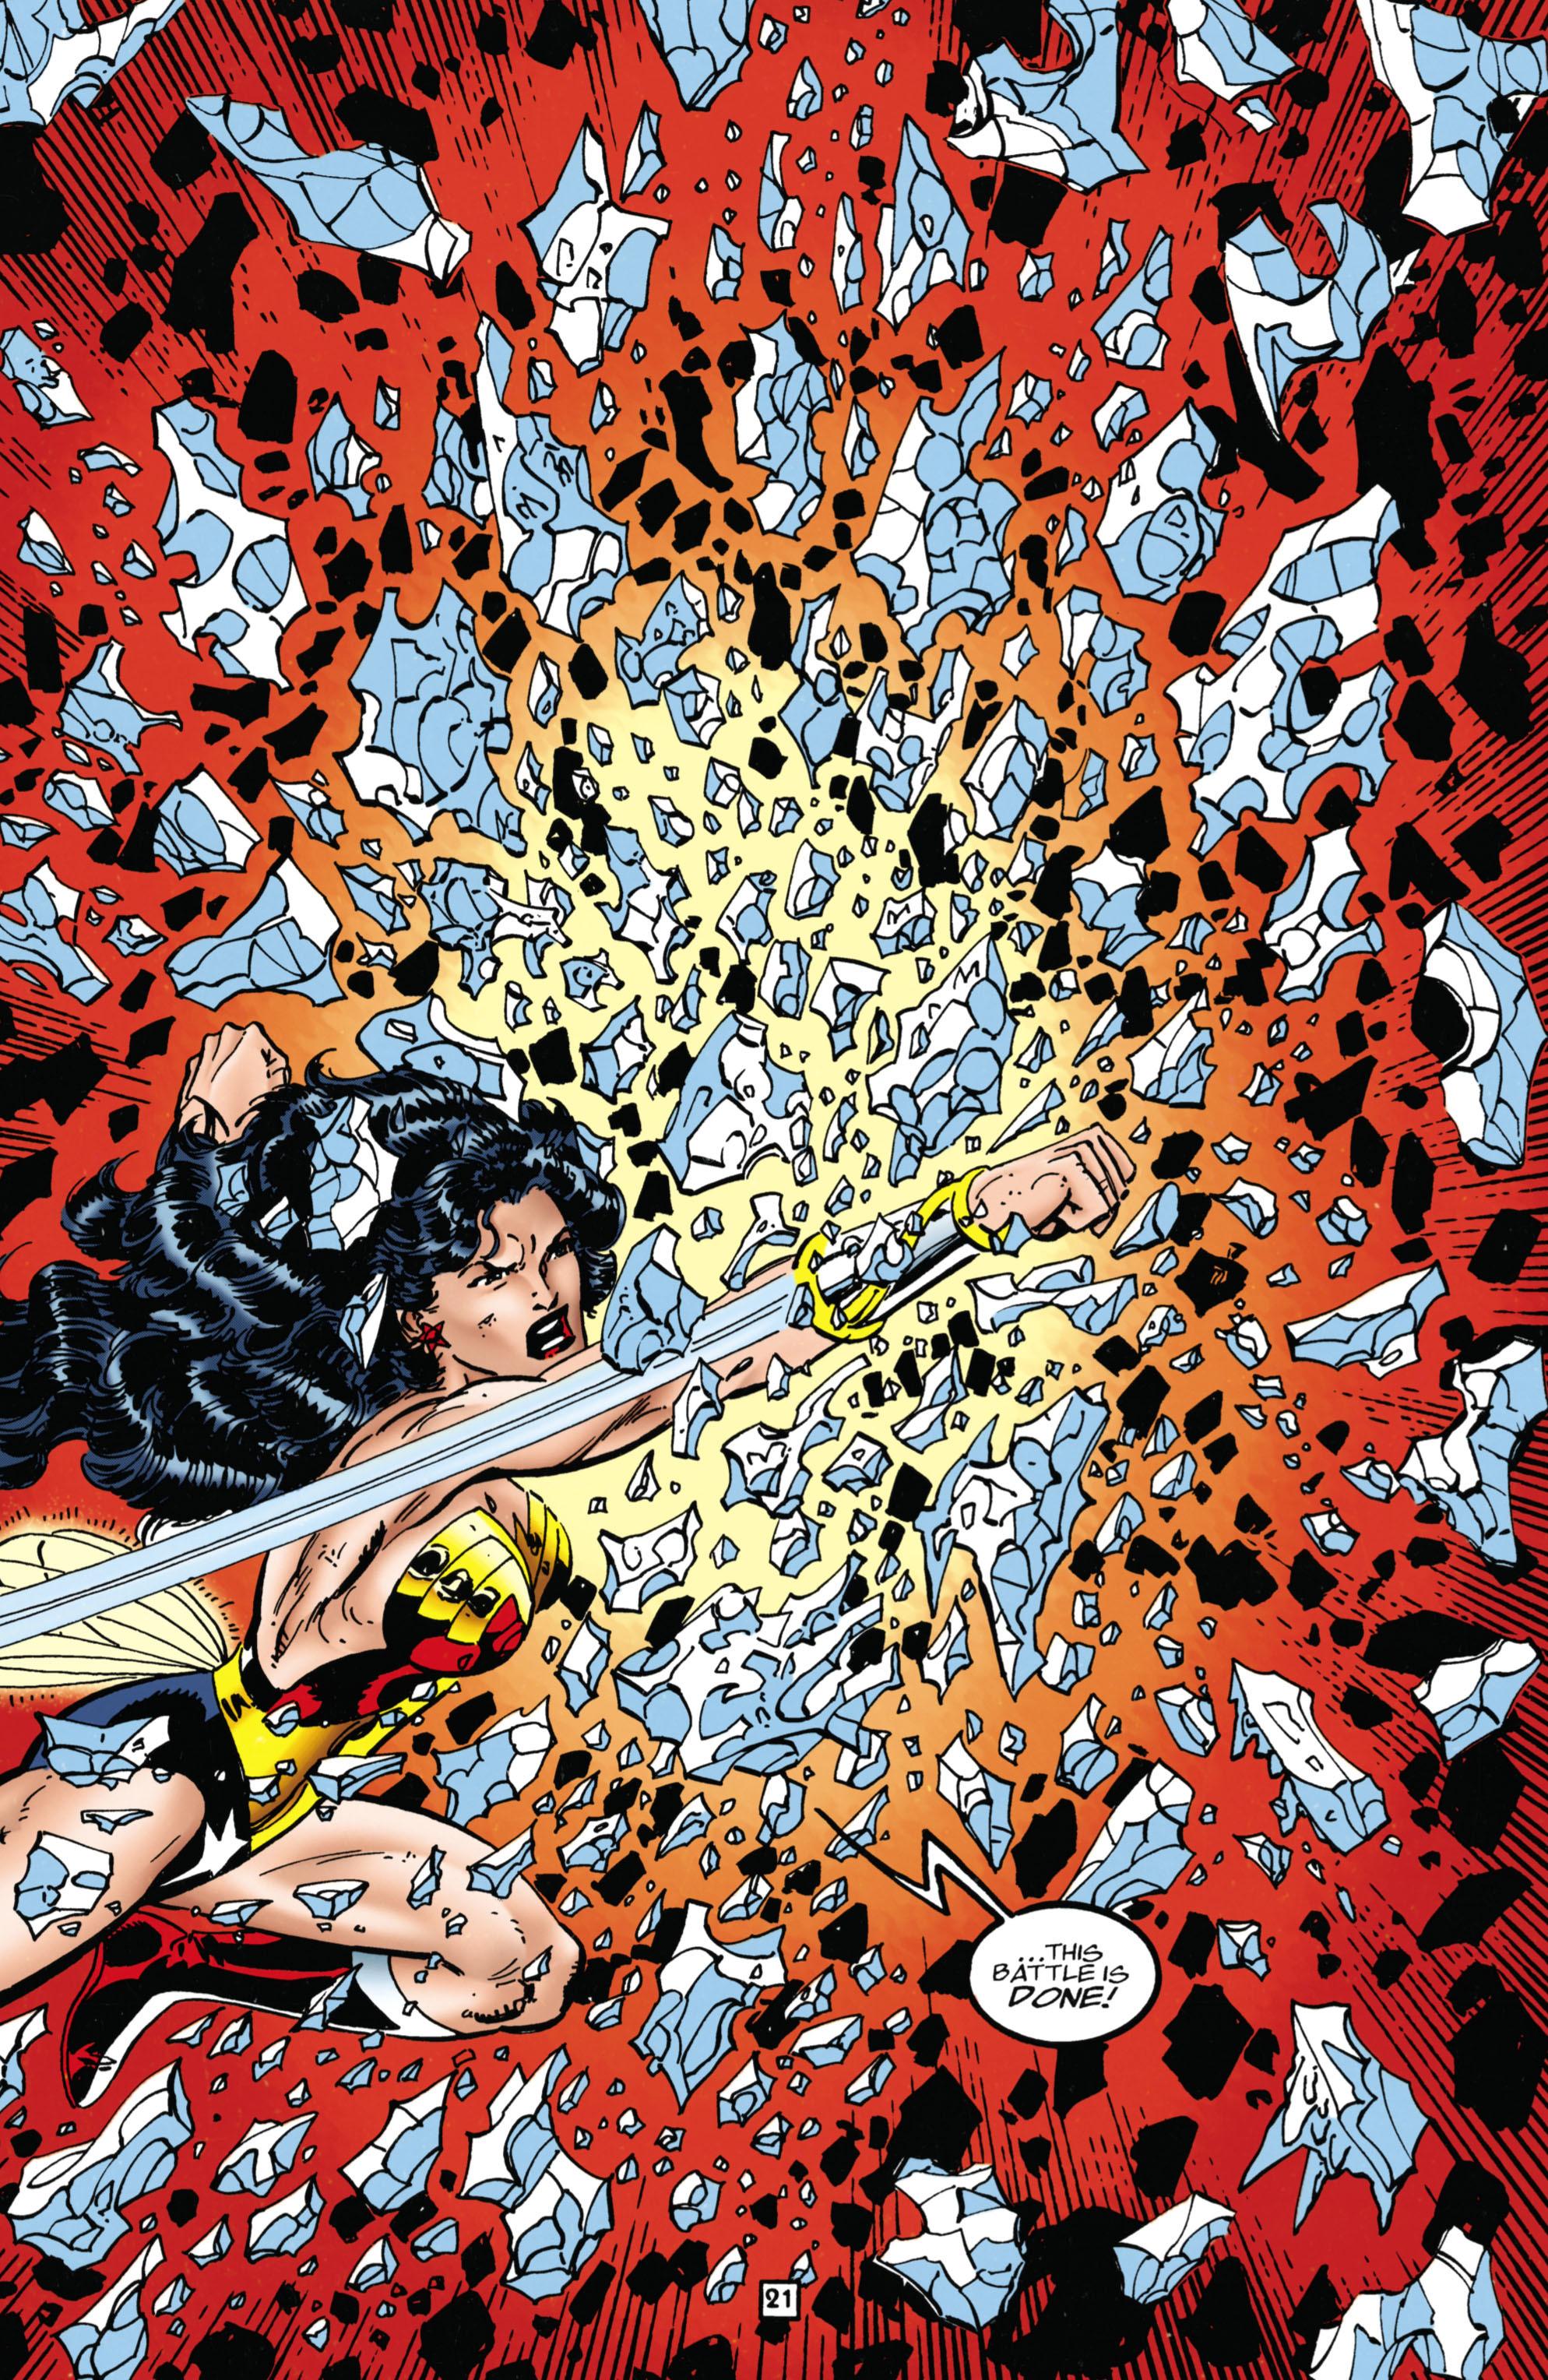 Read online Wonder Woman (1987) comic -  Issue #112 - 21